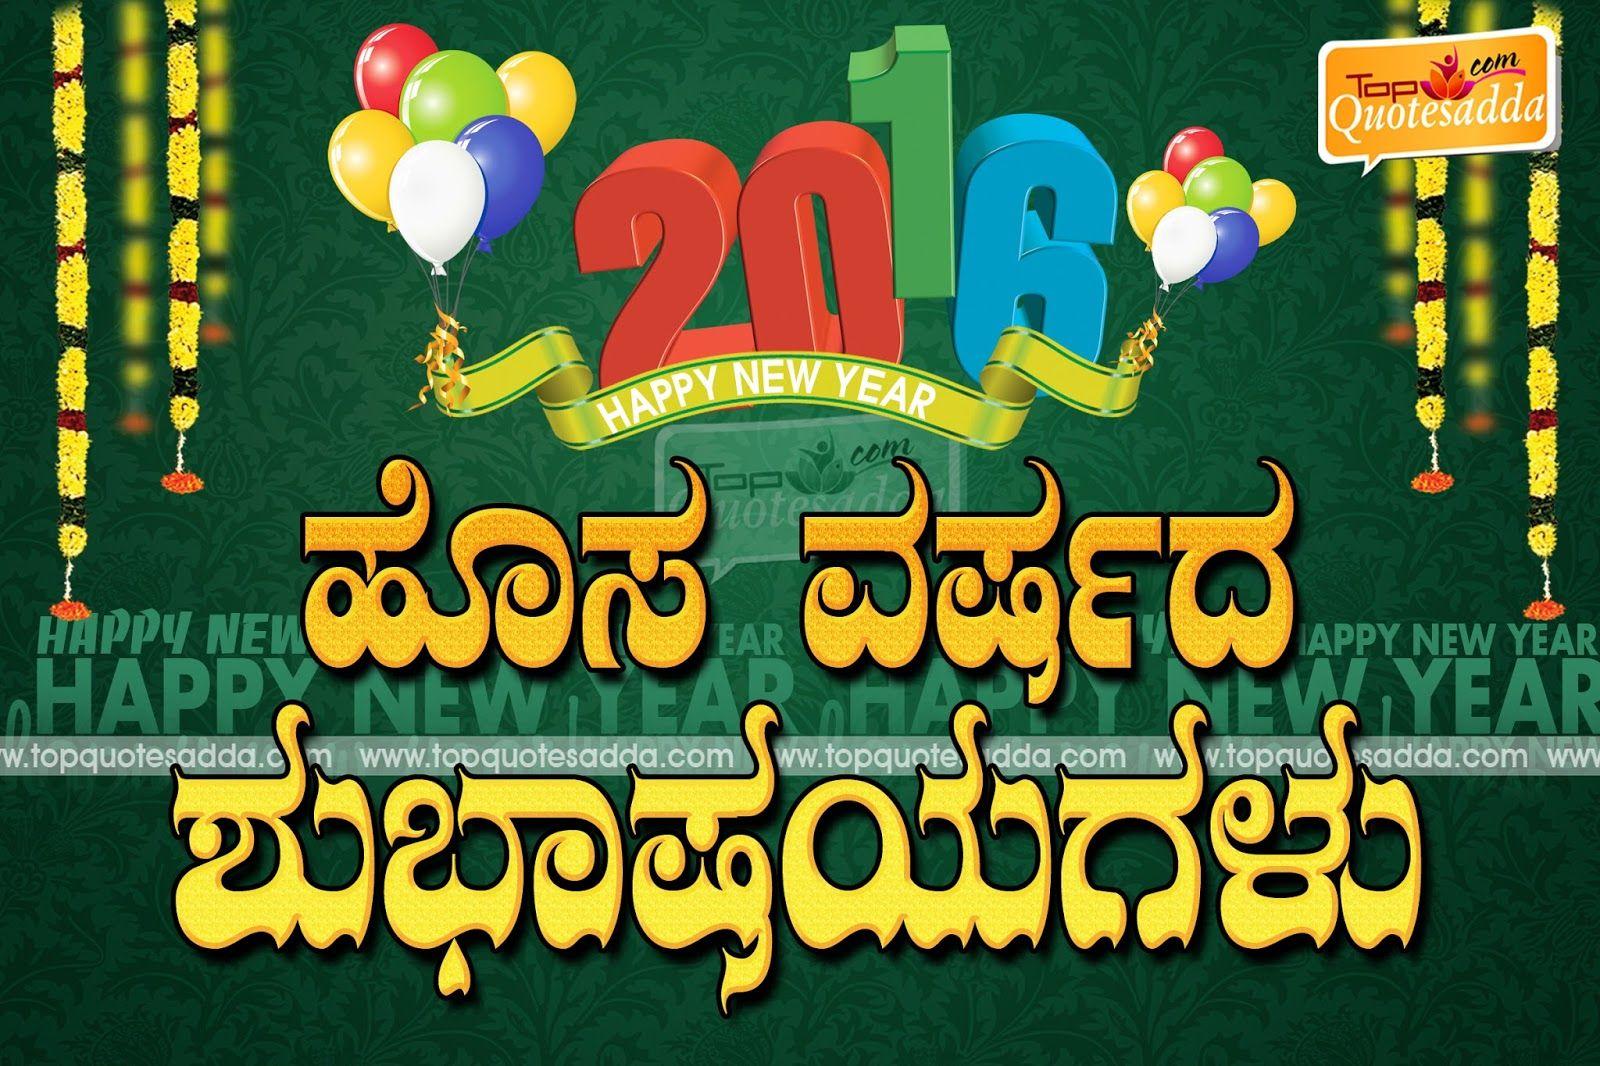 2016 Happy New Year Wishes In Kannada Advance Happy New Year